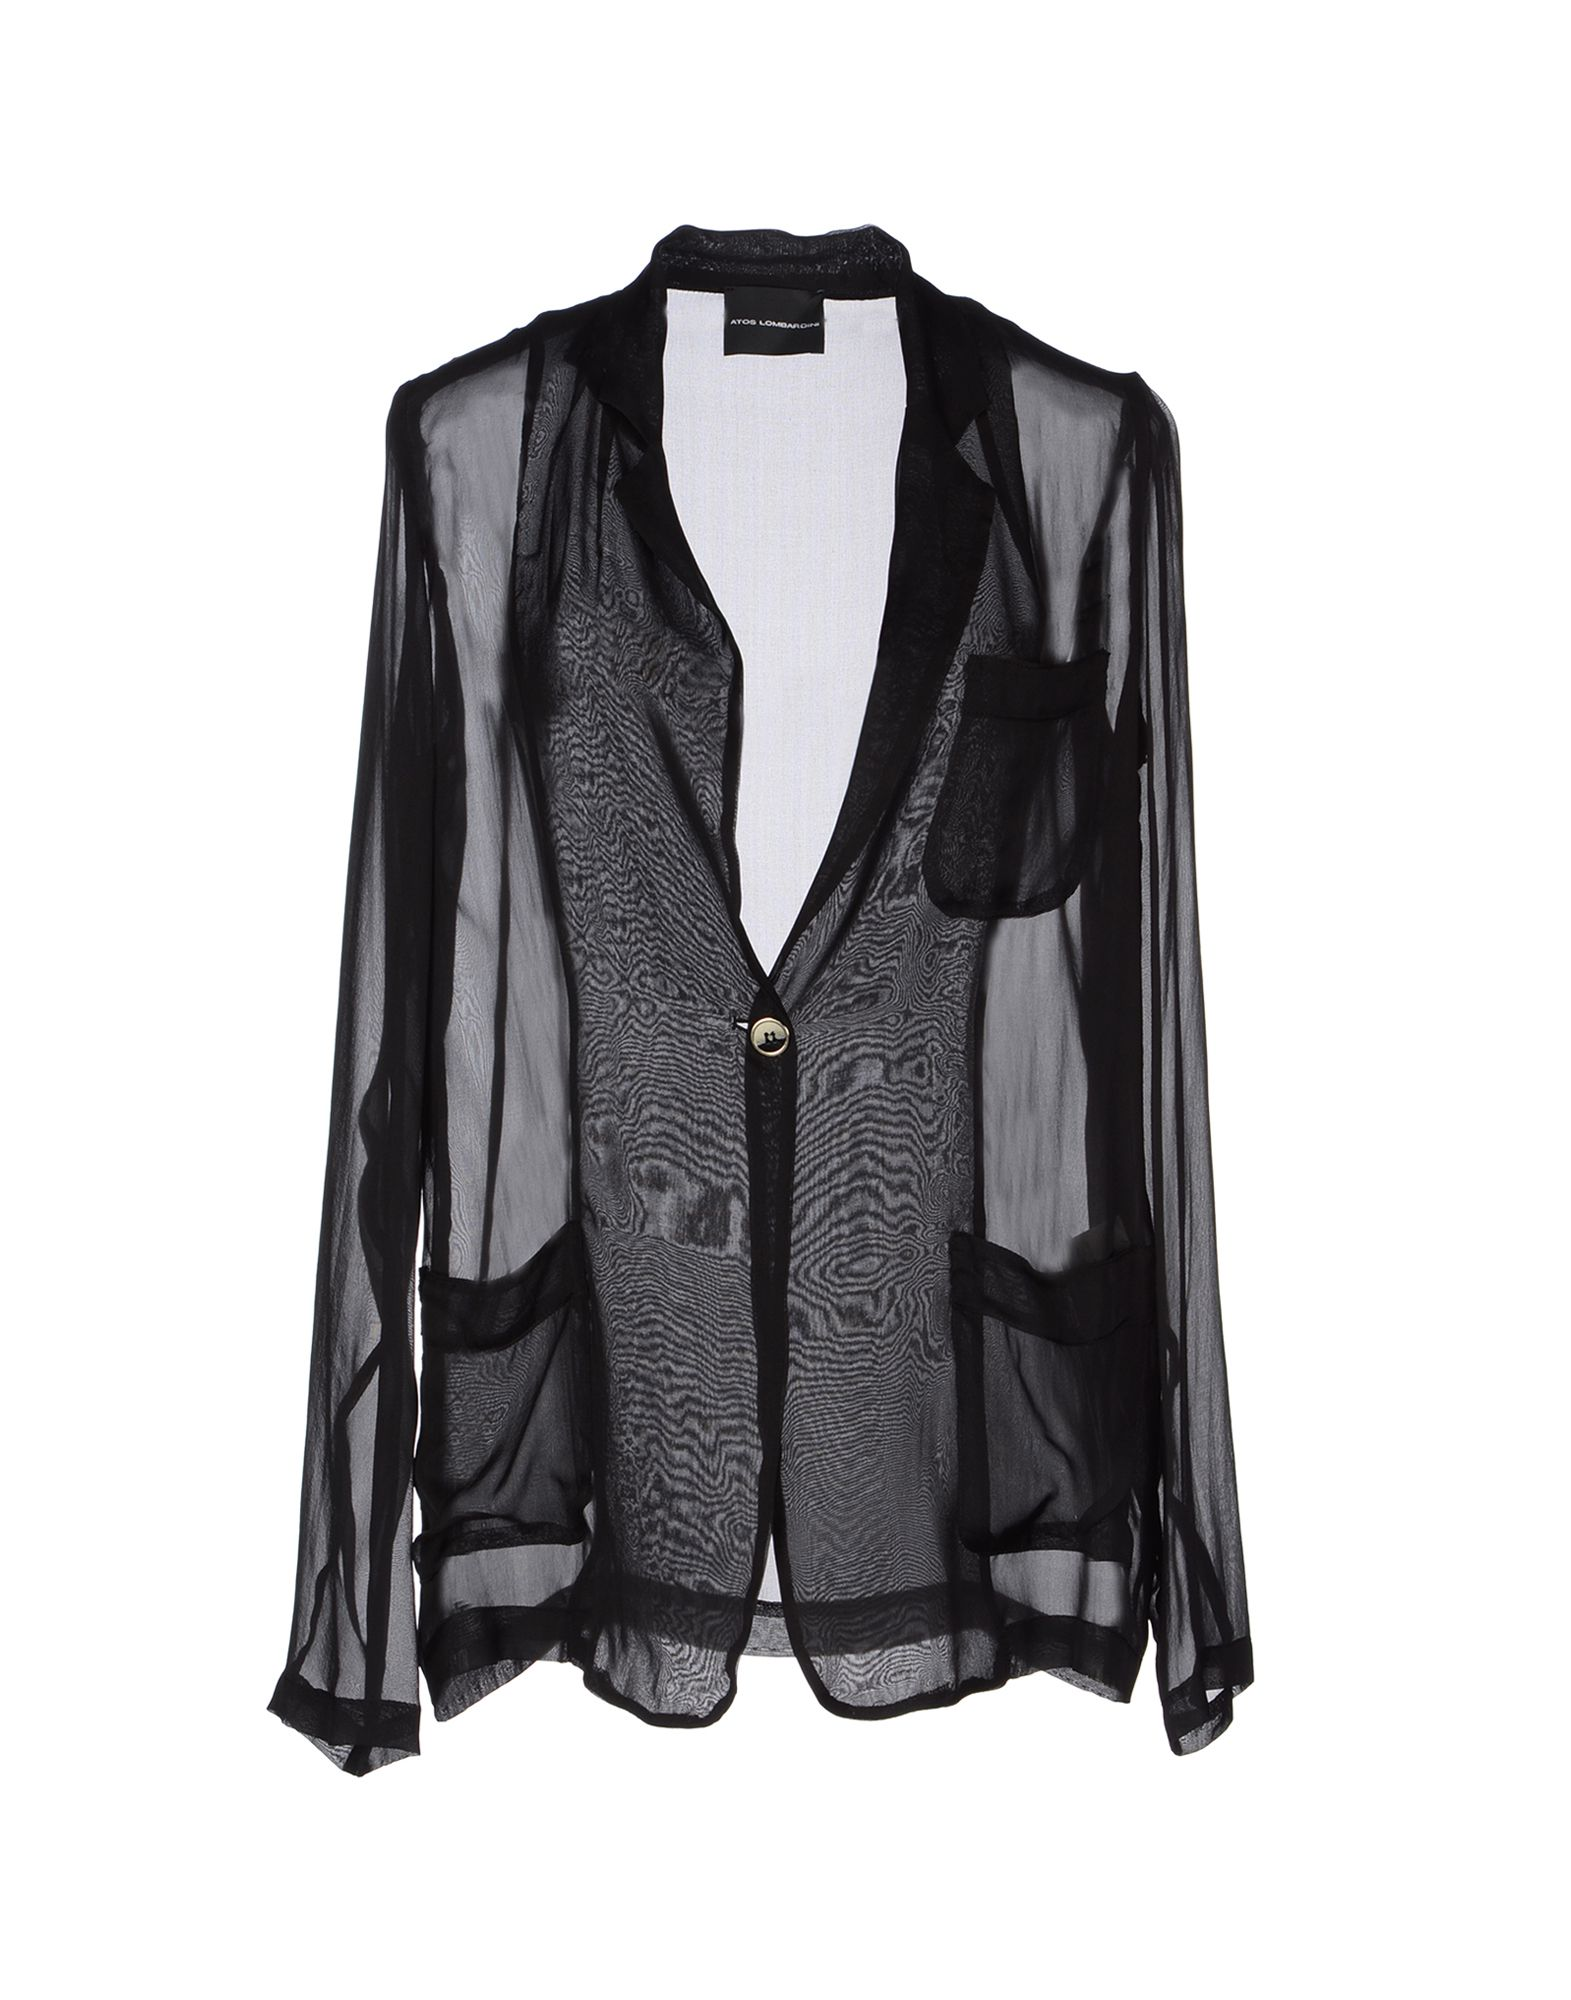 ATOS LOMBARDINI Blazers in Black